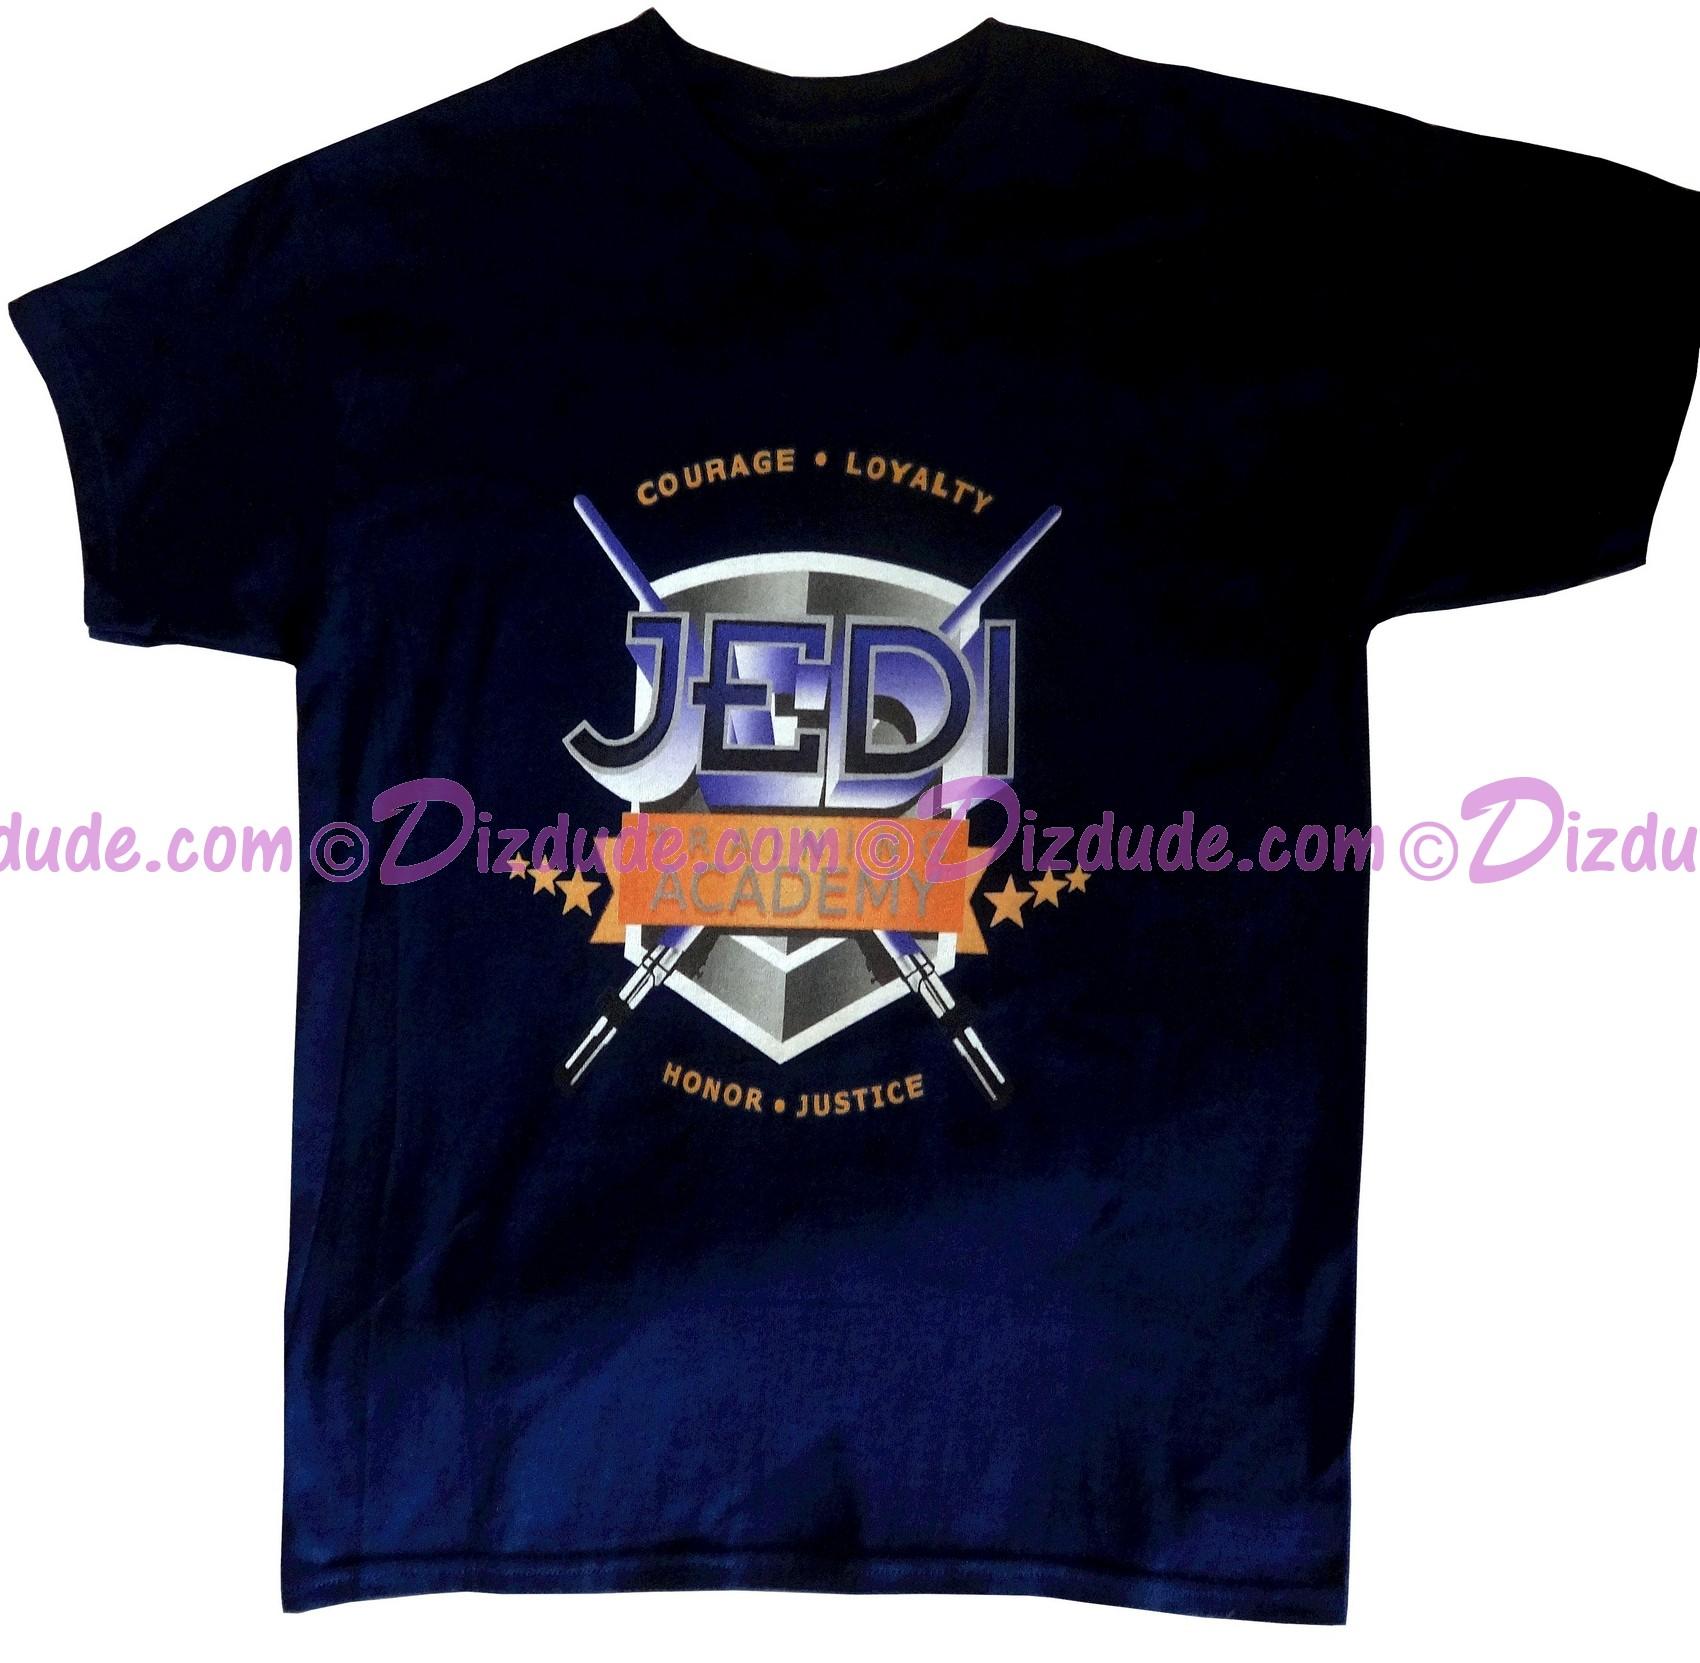 VIintage Star Wars Jedi Training Academy Youth T-Shirt © Dizdude.com